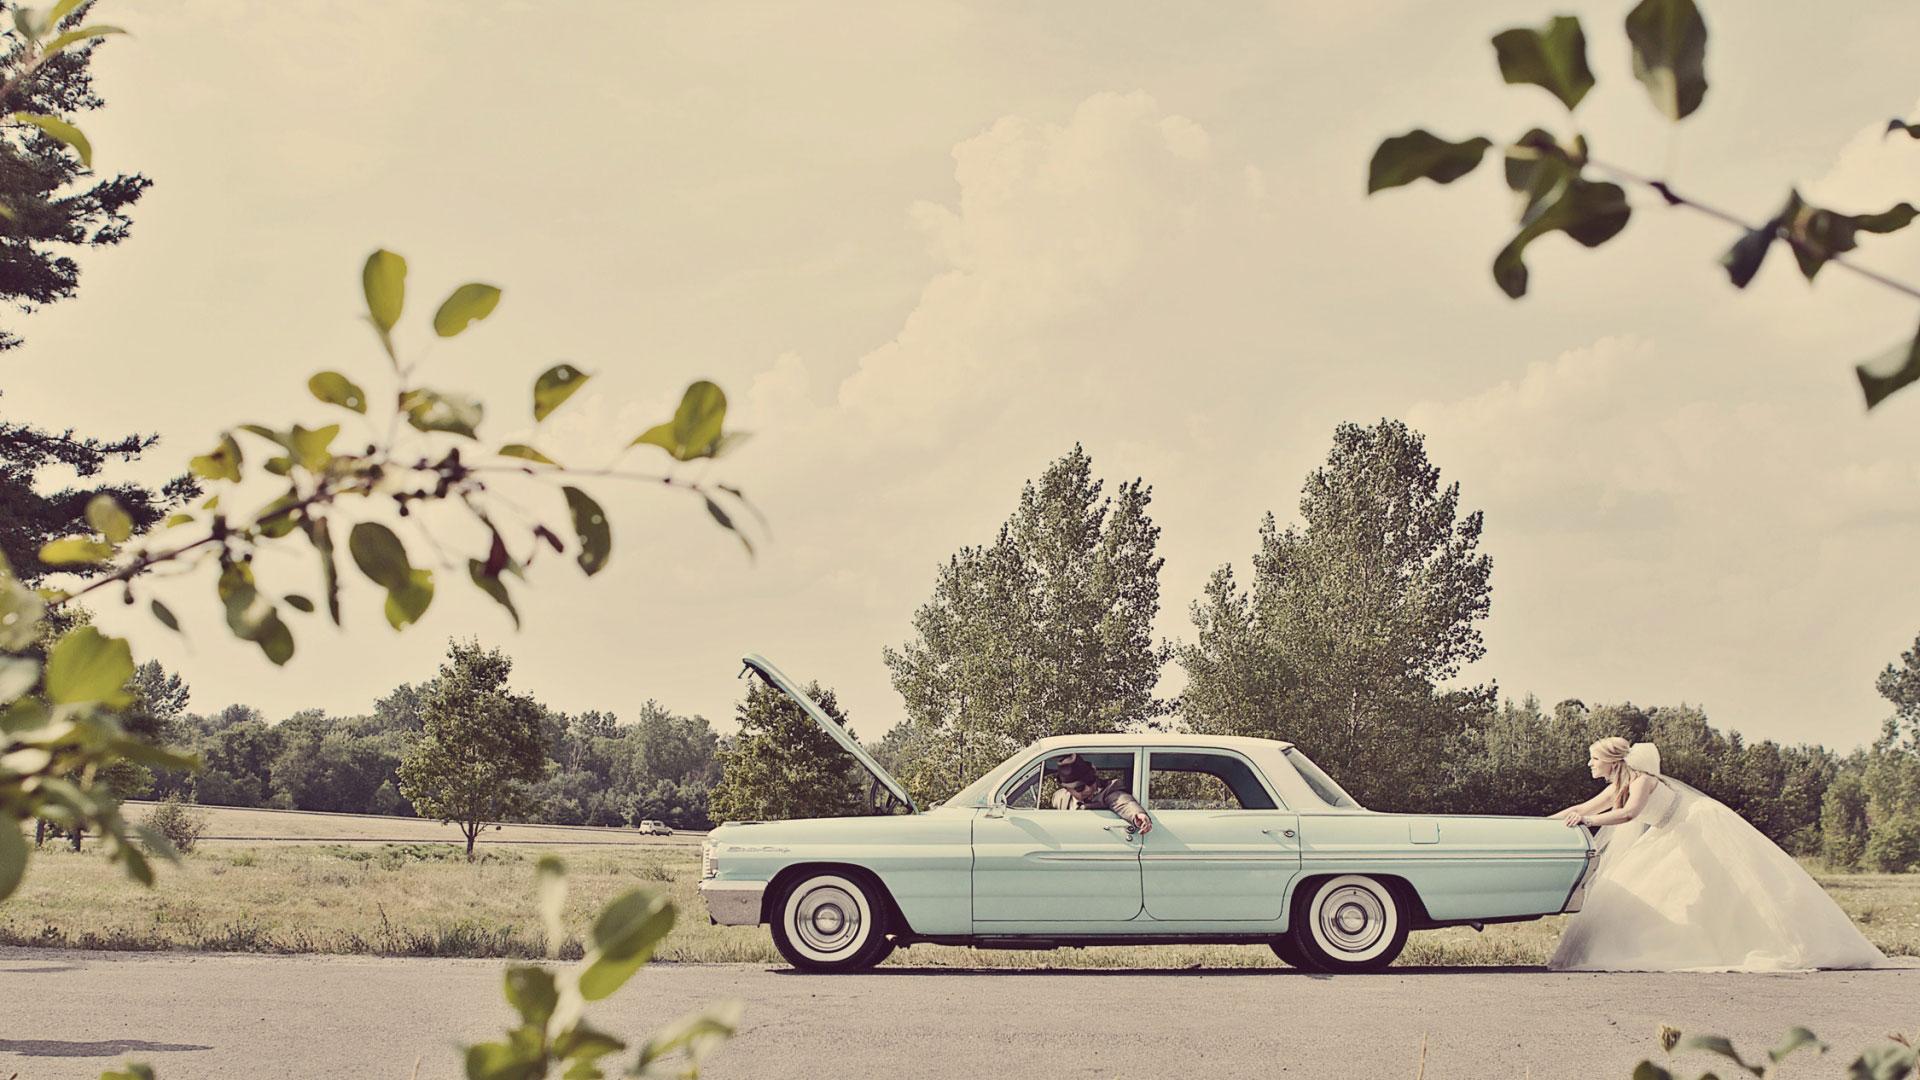 Bride pushing groom in blue vintage car | Sala San Marco | Renaissance Studios